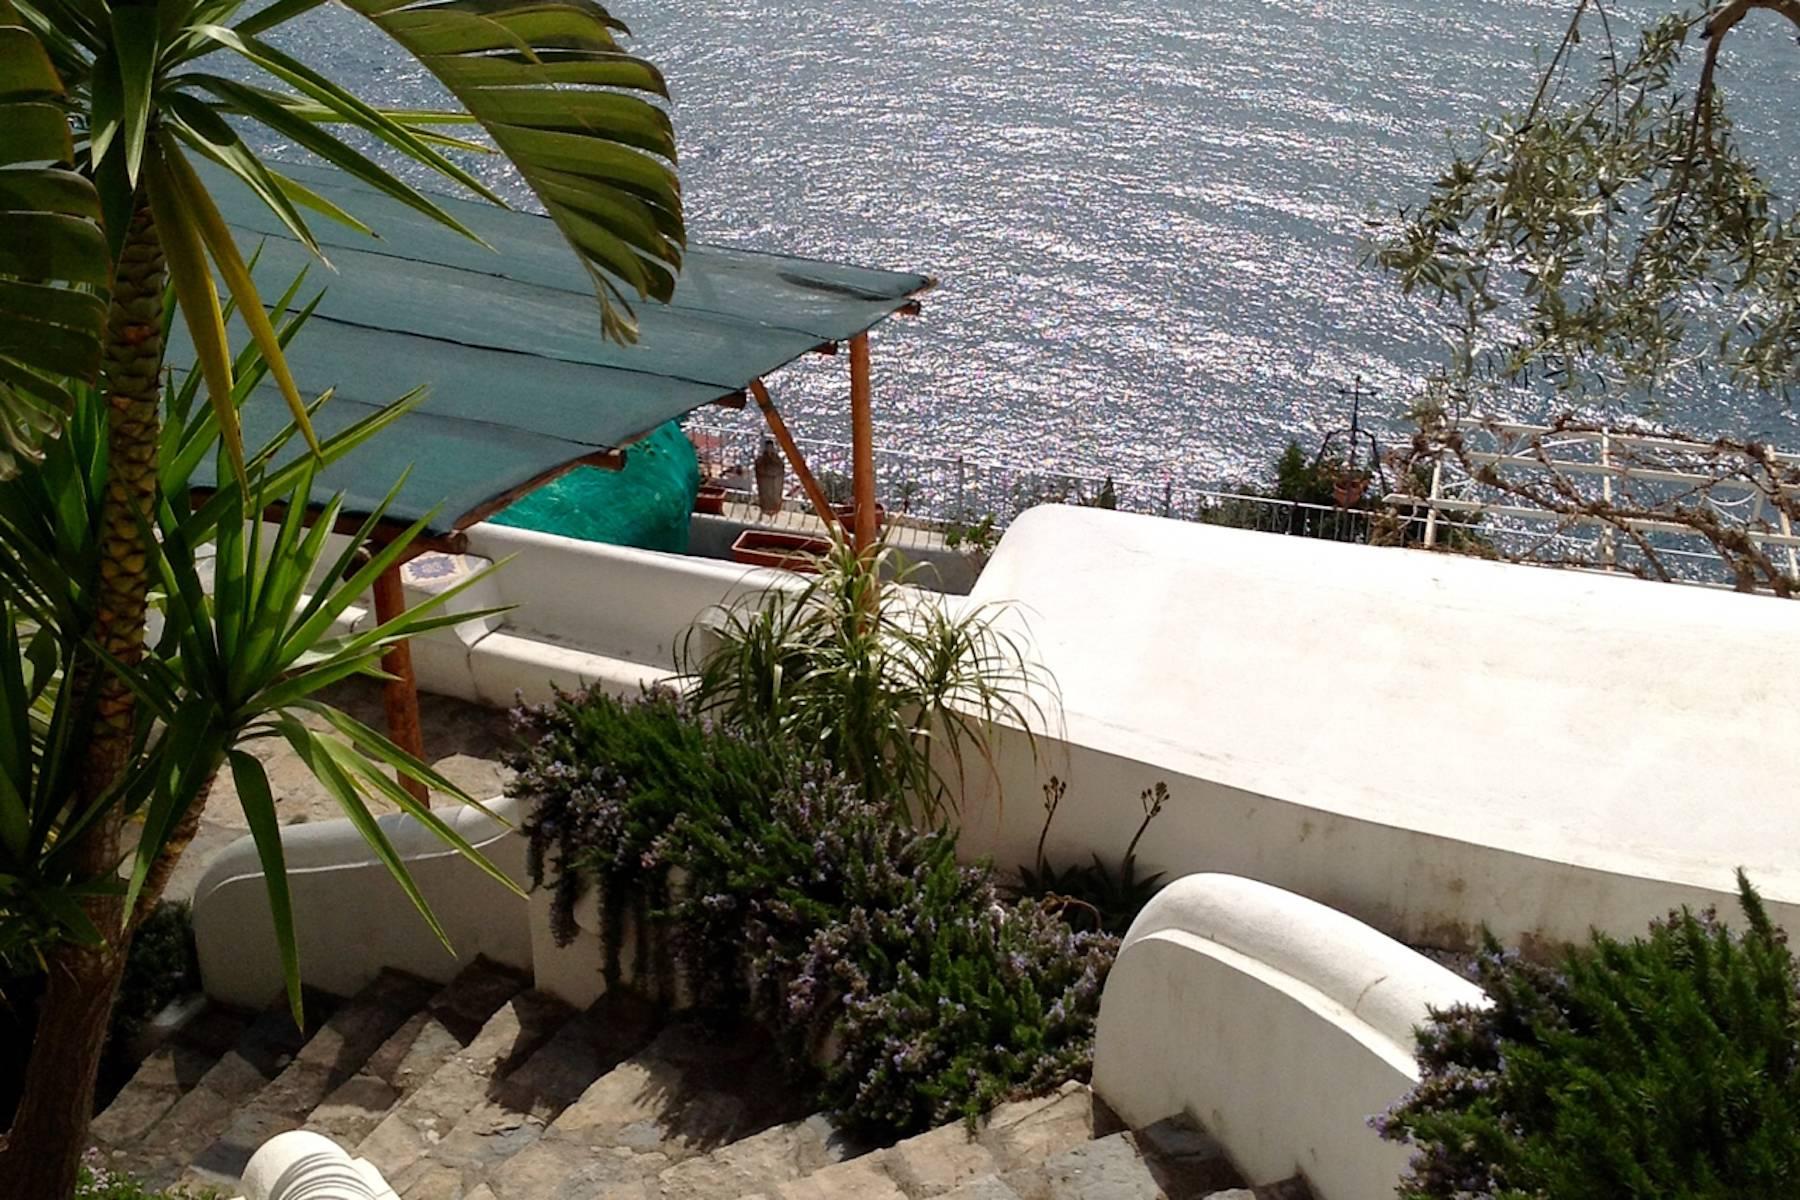 Casa indipendente in Vendita a Praiano: 4 locali, 250 mq - Foto 25